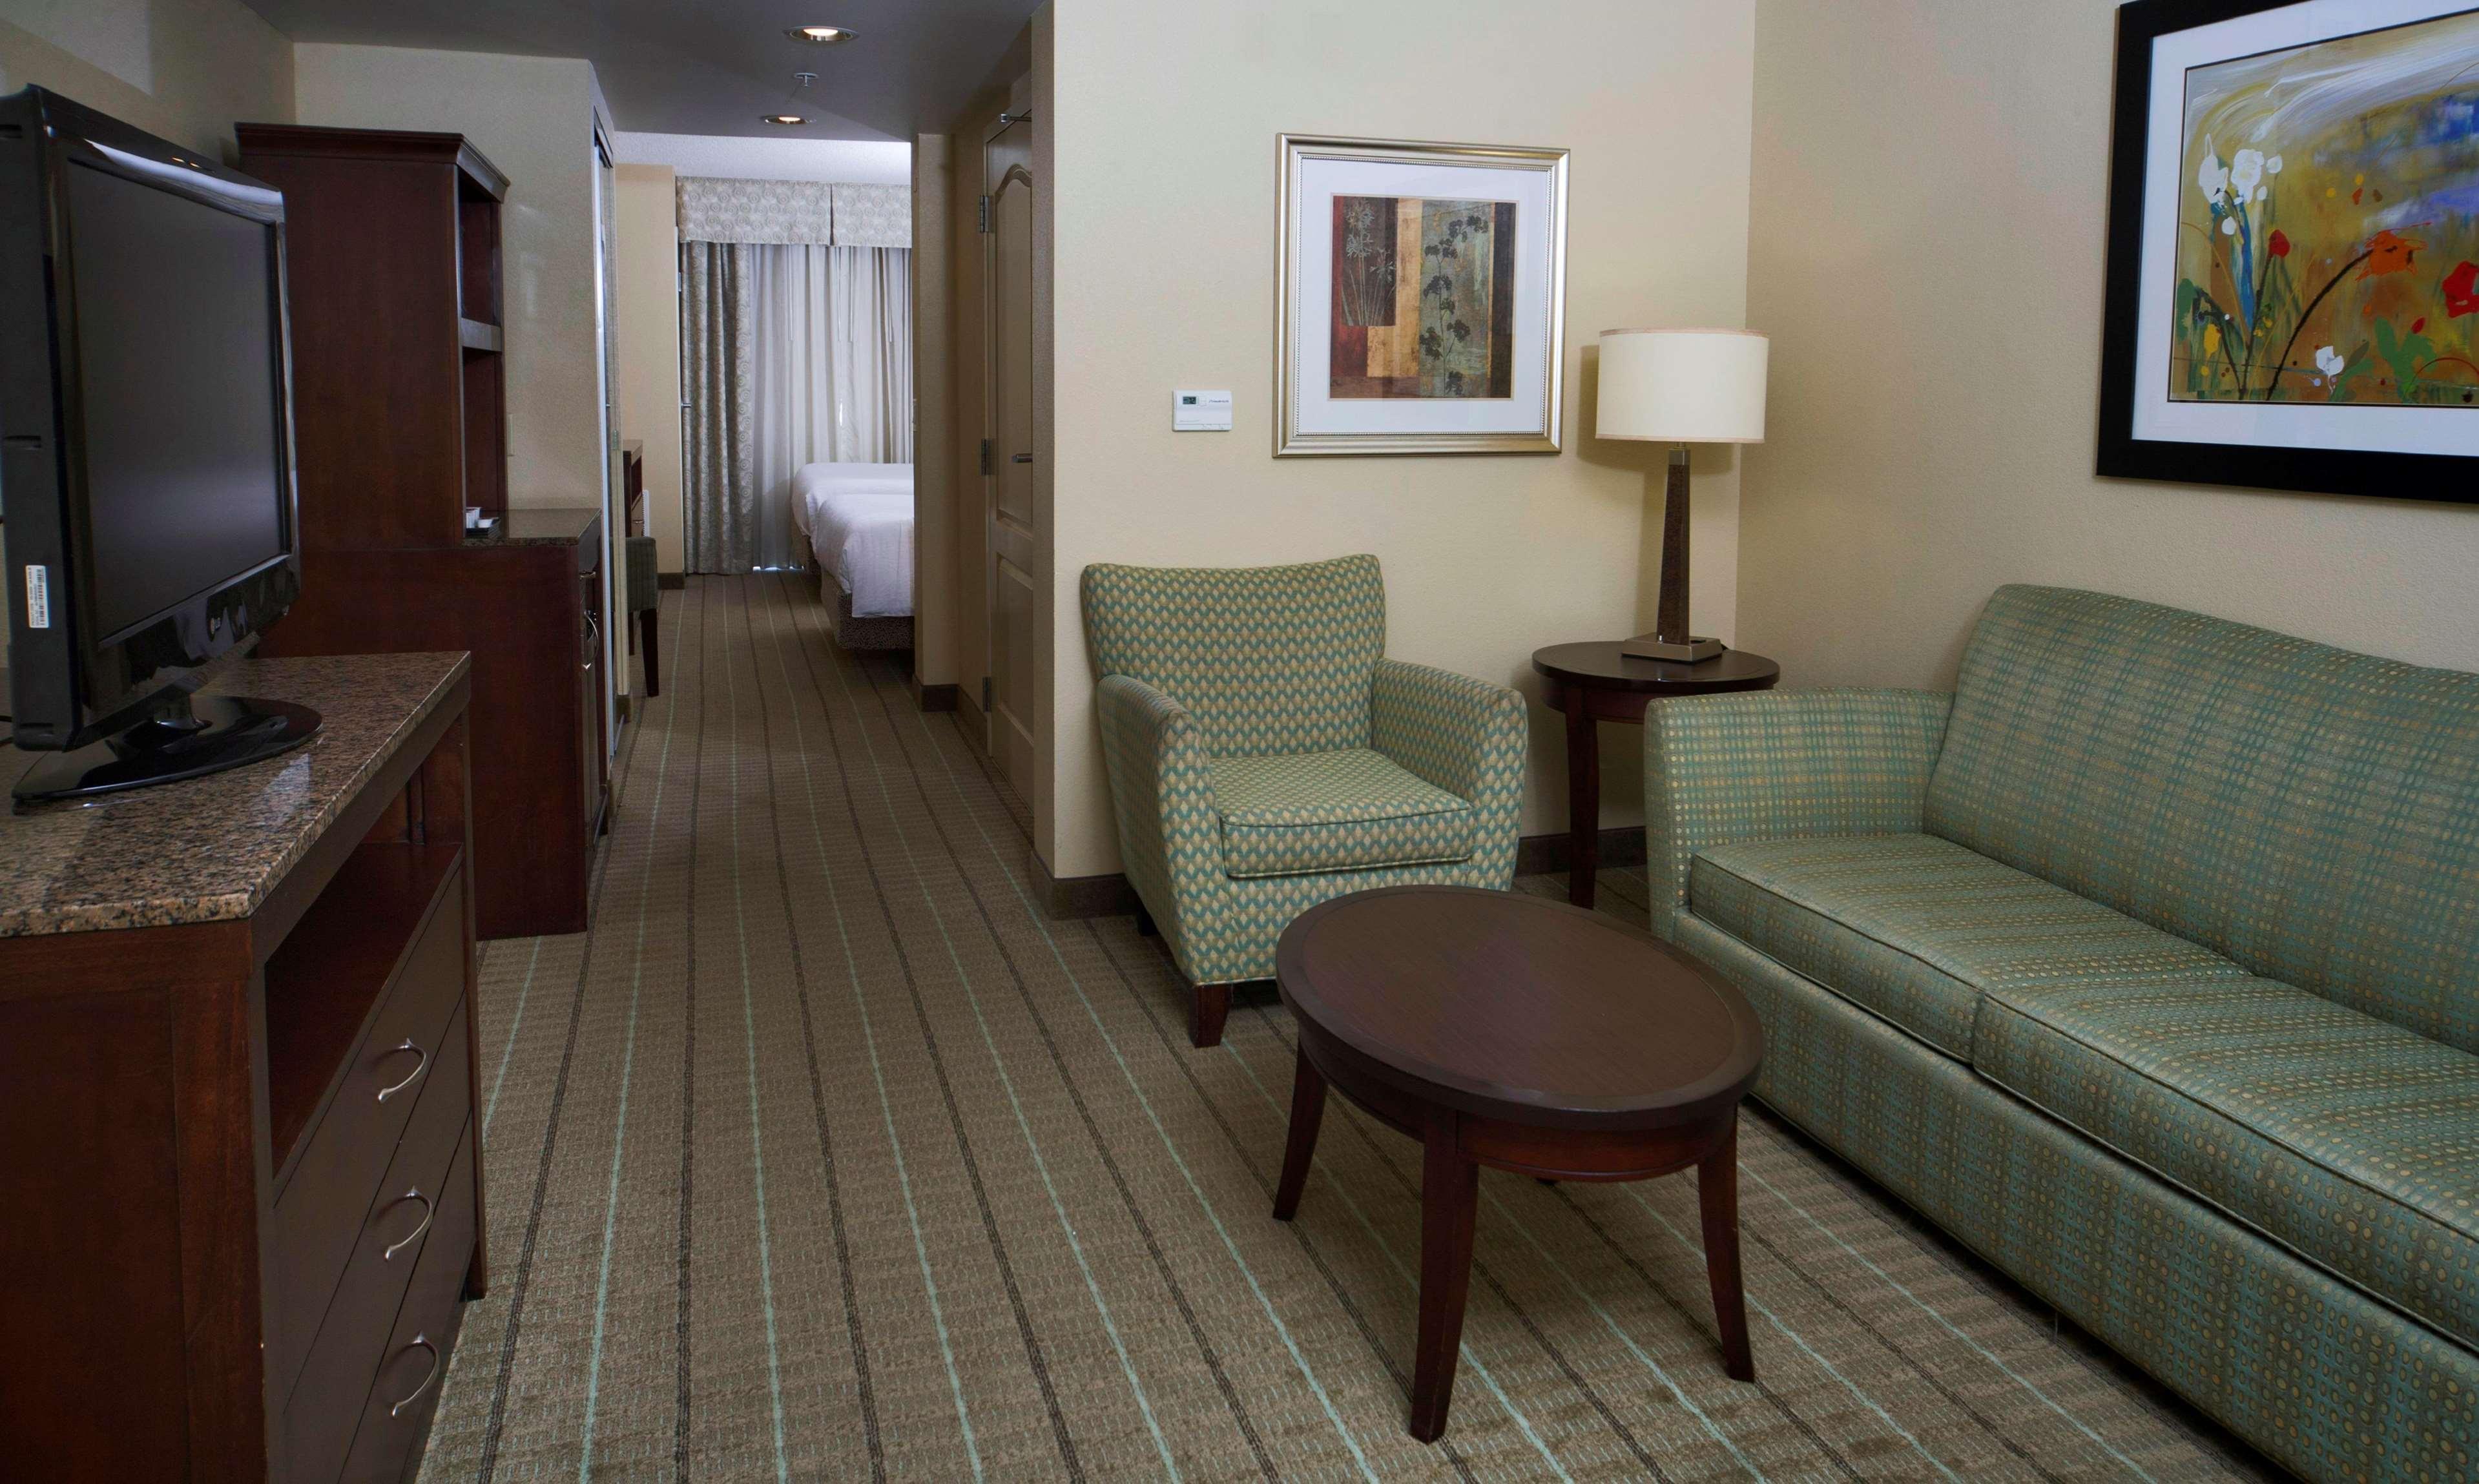 Hilton Garden Inn Valdosta 1702 Gornto Drive Valdosta, GA Hotels U0026 Motels    MapQuest